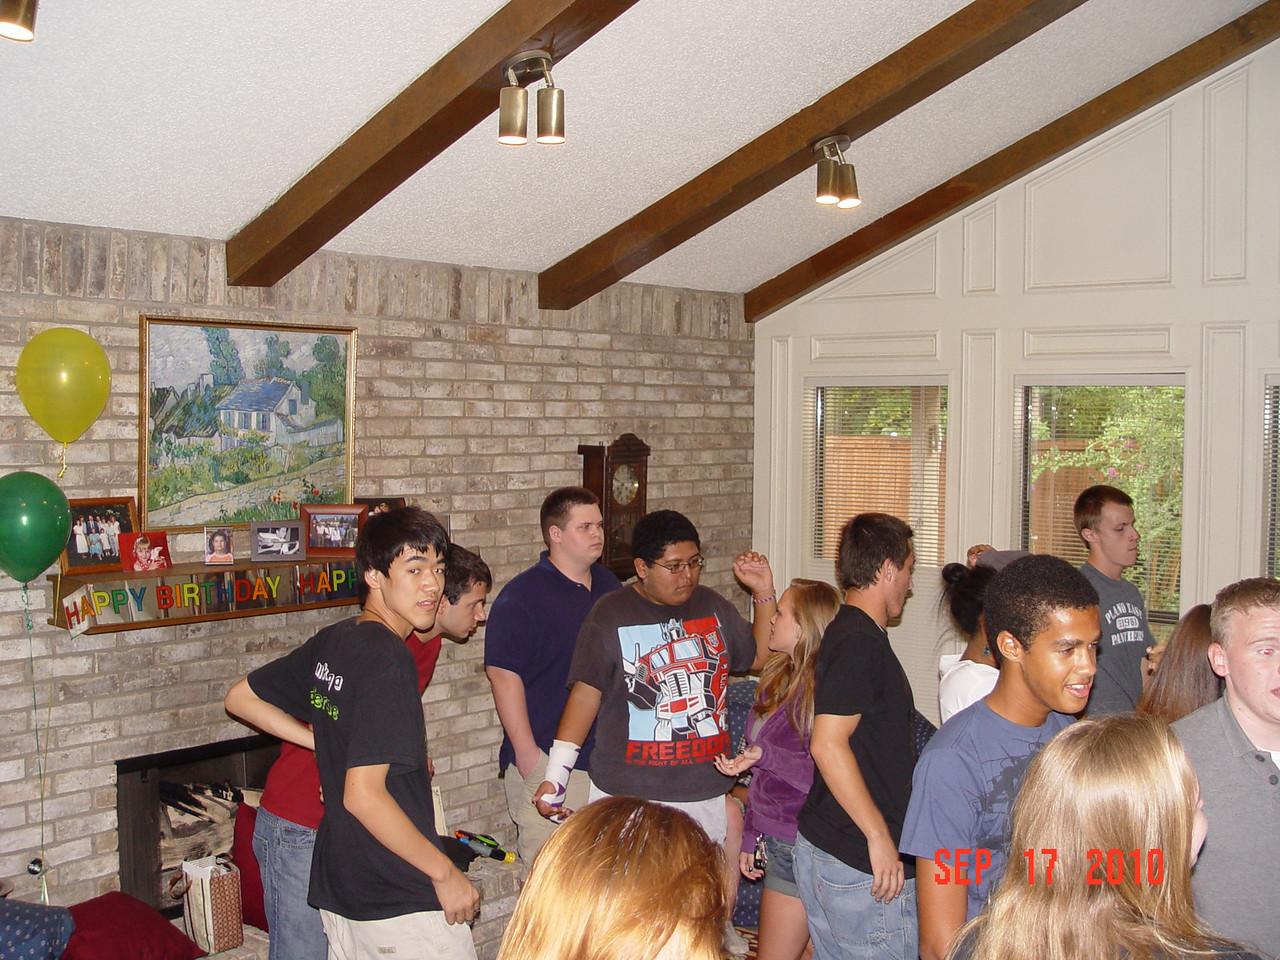 2010-09-17-devons-party-cisco-party 037DevonParty